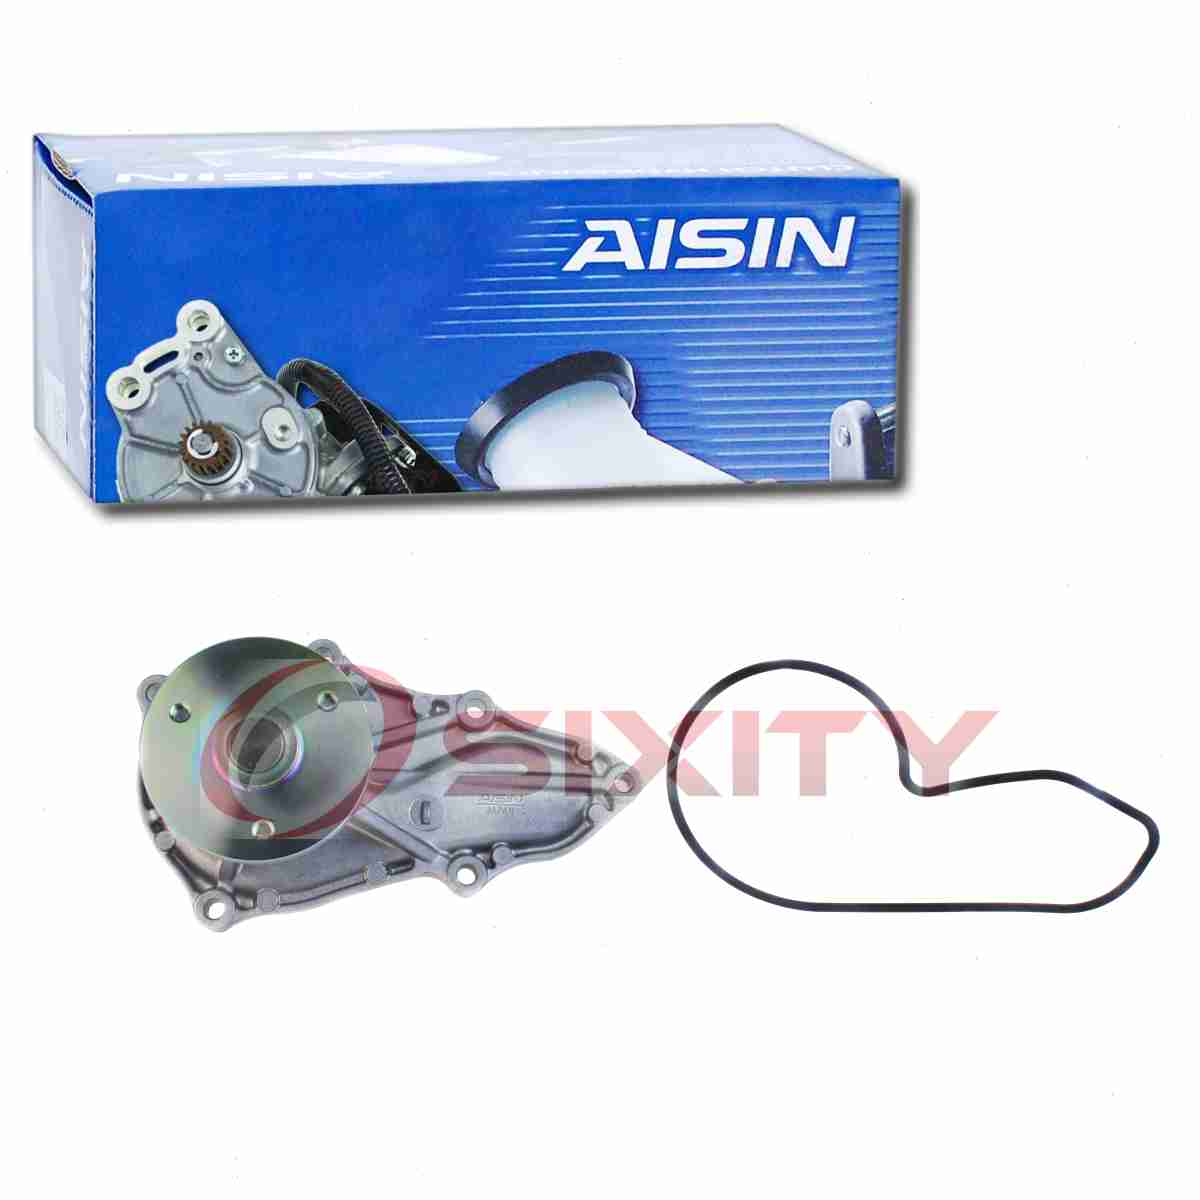 AISIN Engine Water Pump for 2002-2006 Honda CR-V 2.4L L4 Coolant Antifreeze op